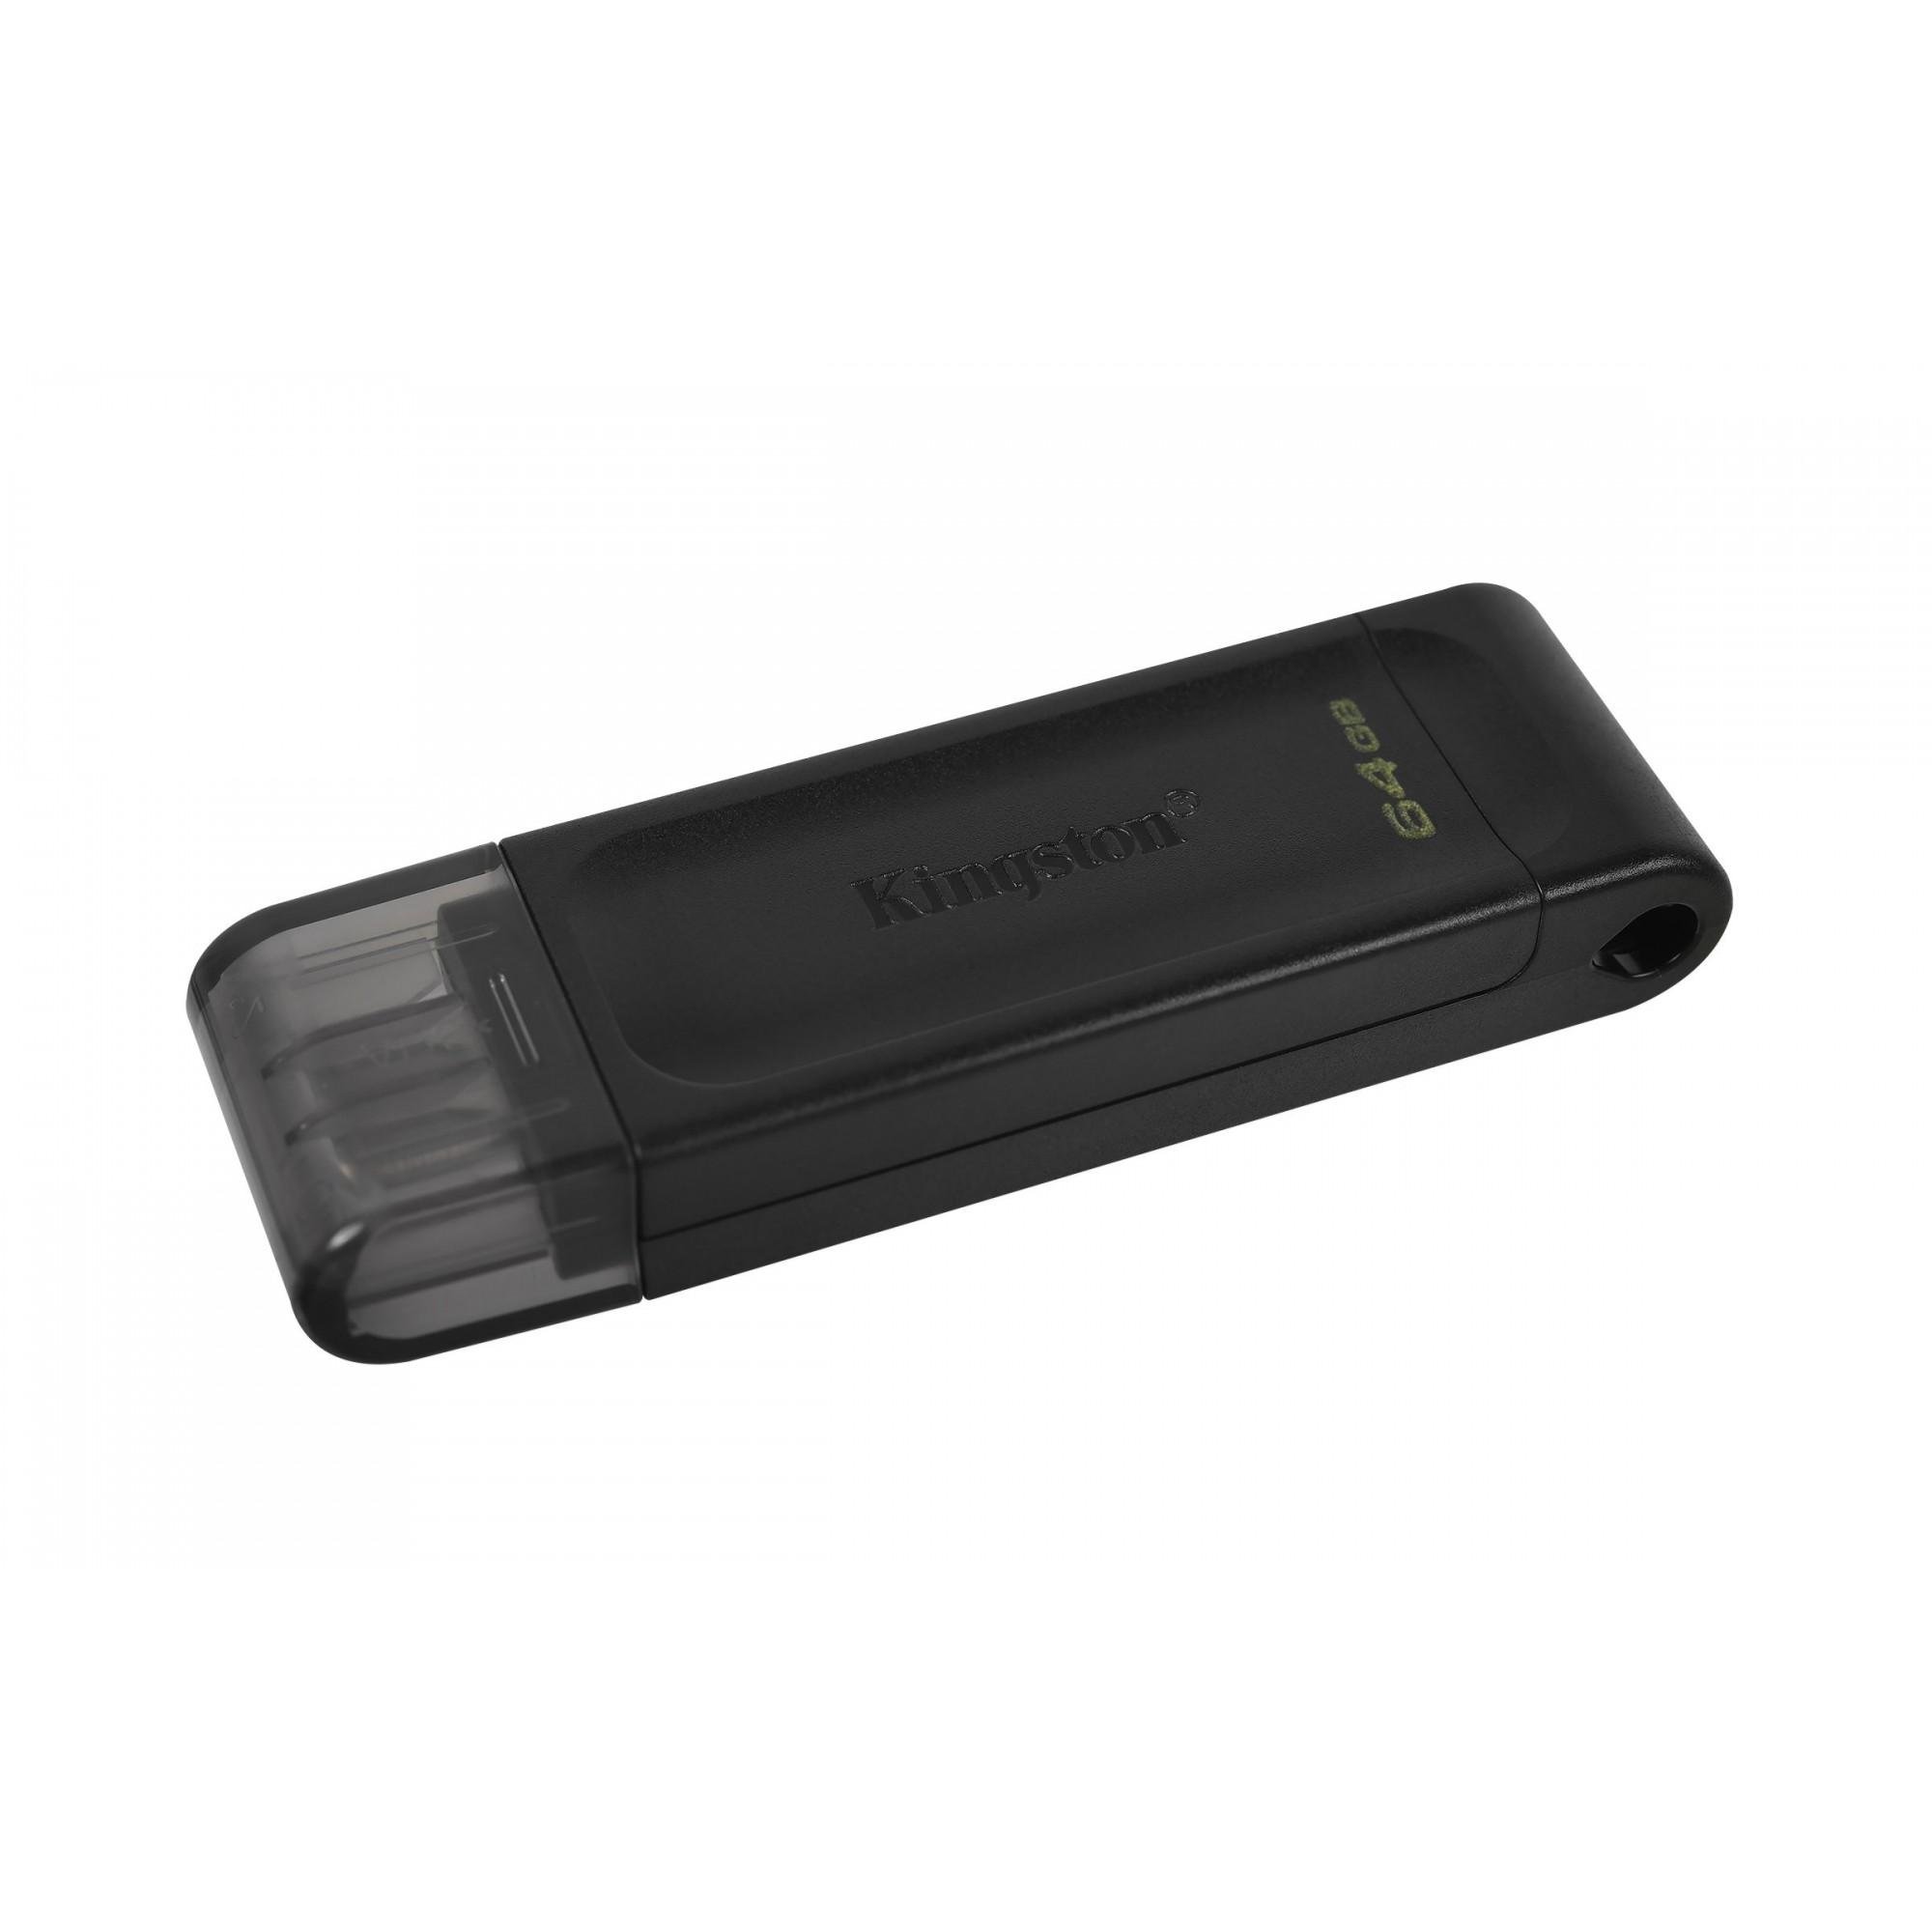 Pen Drive USB 3.2 DT70 DATATRAVELER 70 64GB USB-C